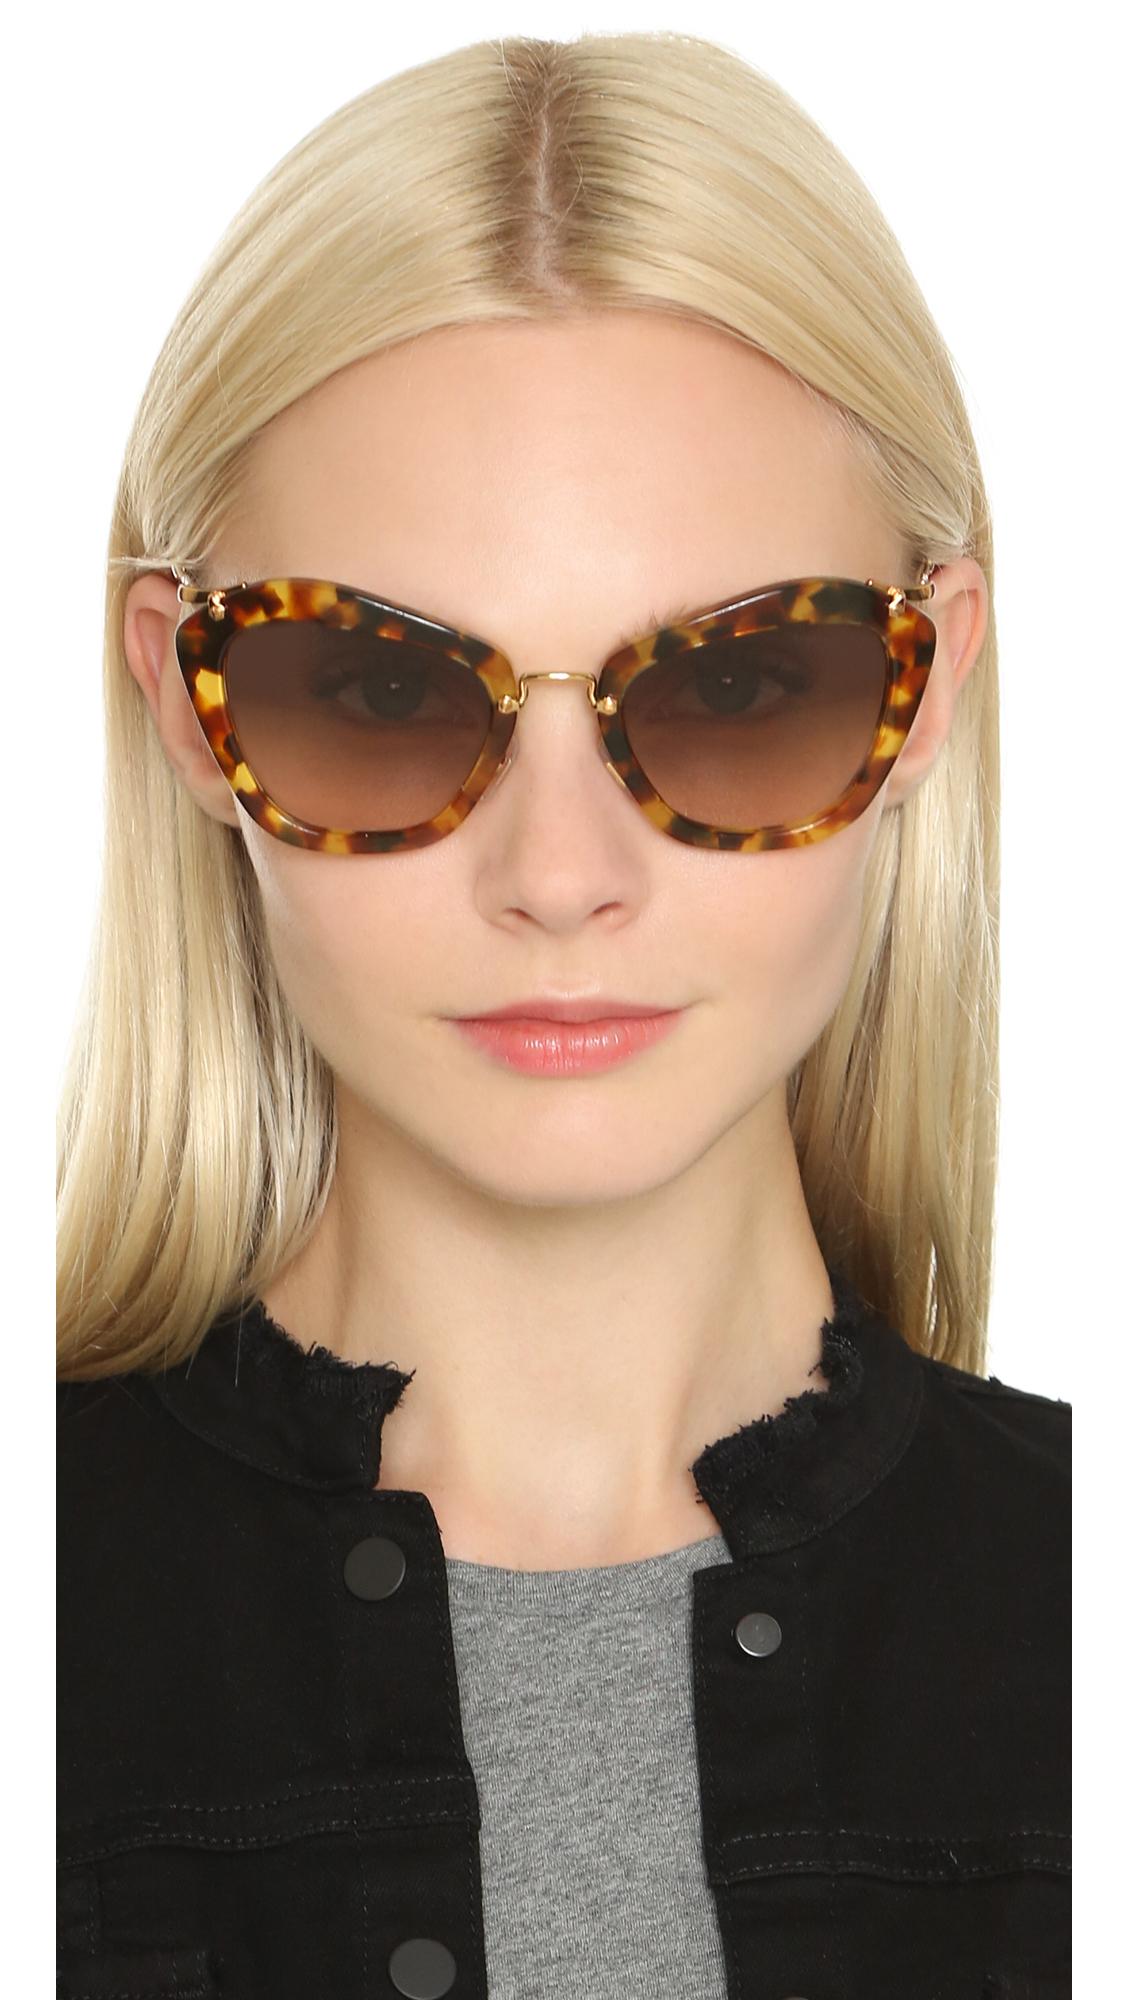 Lyst Miu Miu Cat Eye Sunglasses Light Havana Brown